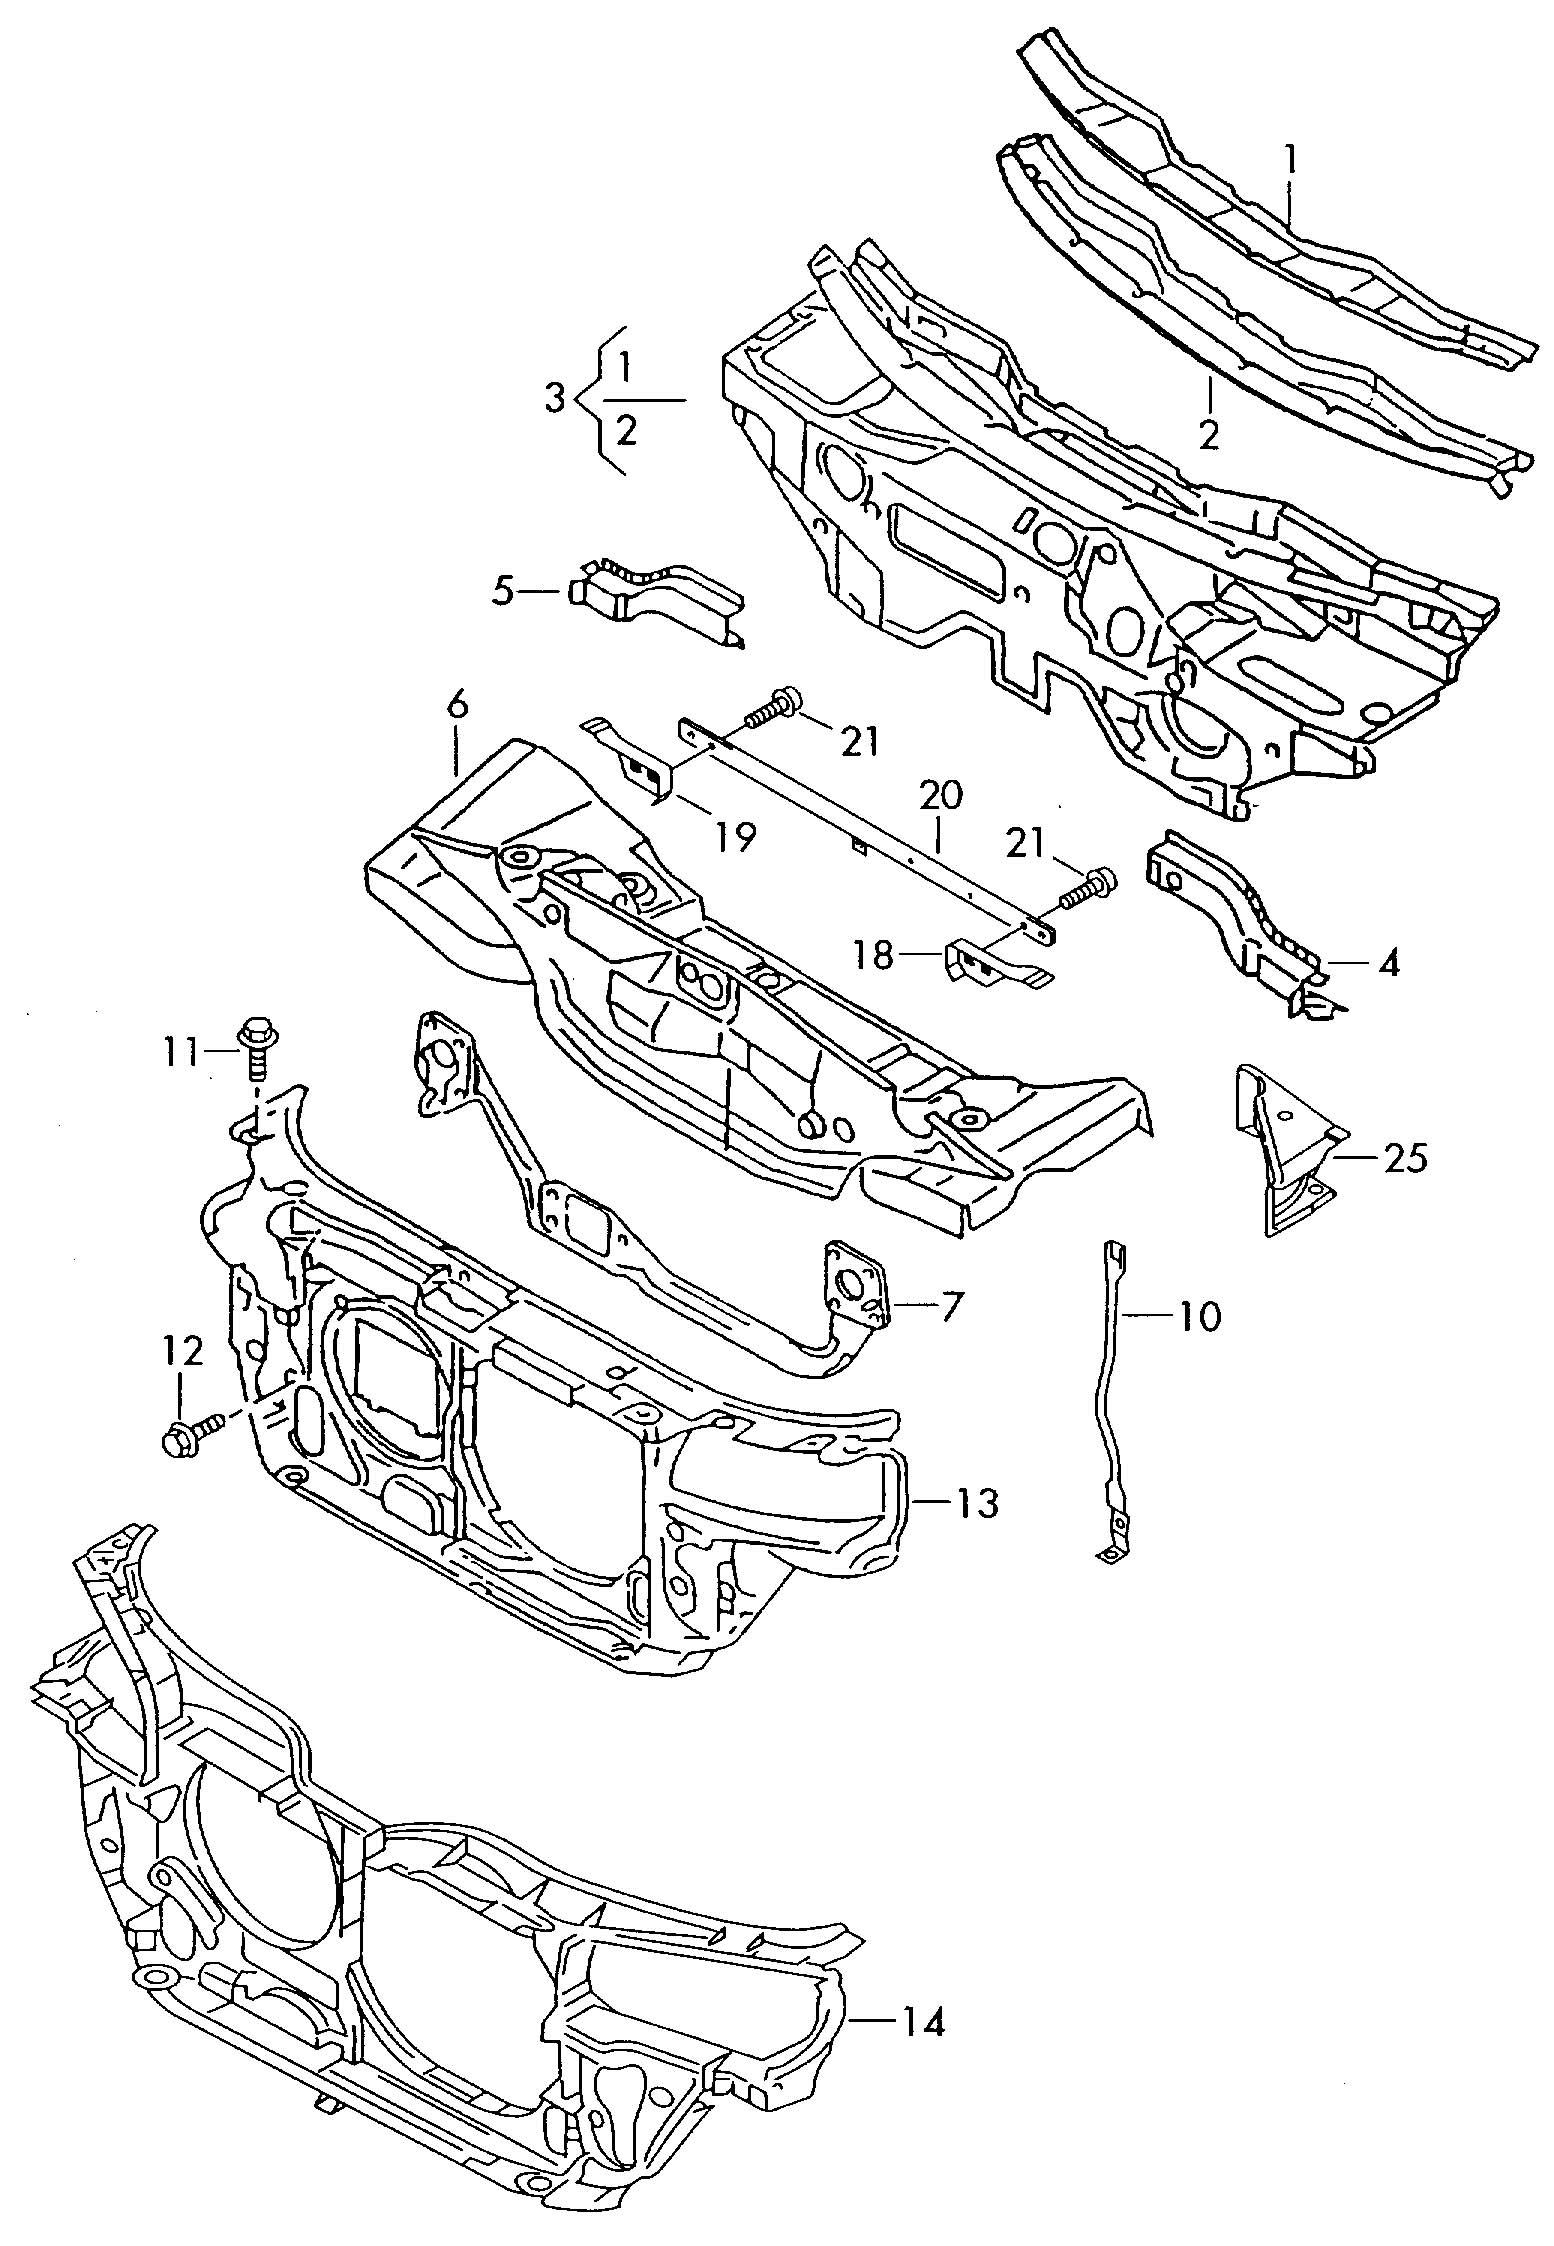 Volkswagen Vw Passat Syncro Body Front Section Dash Panel